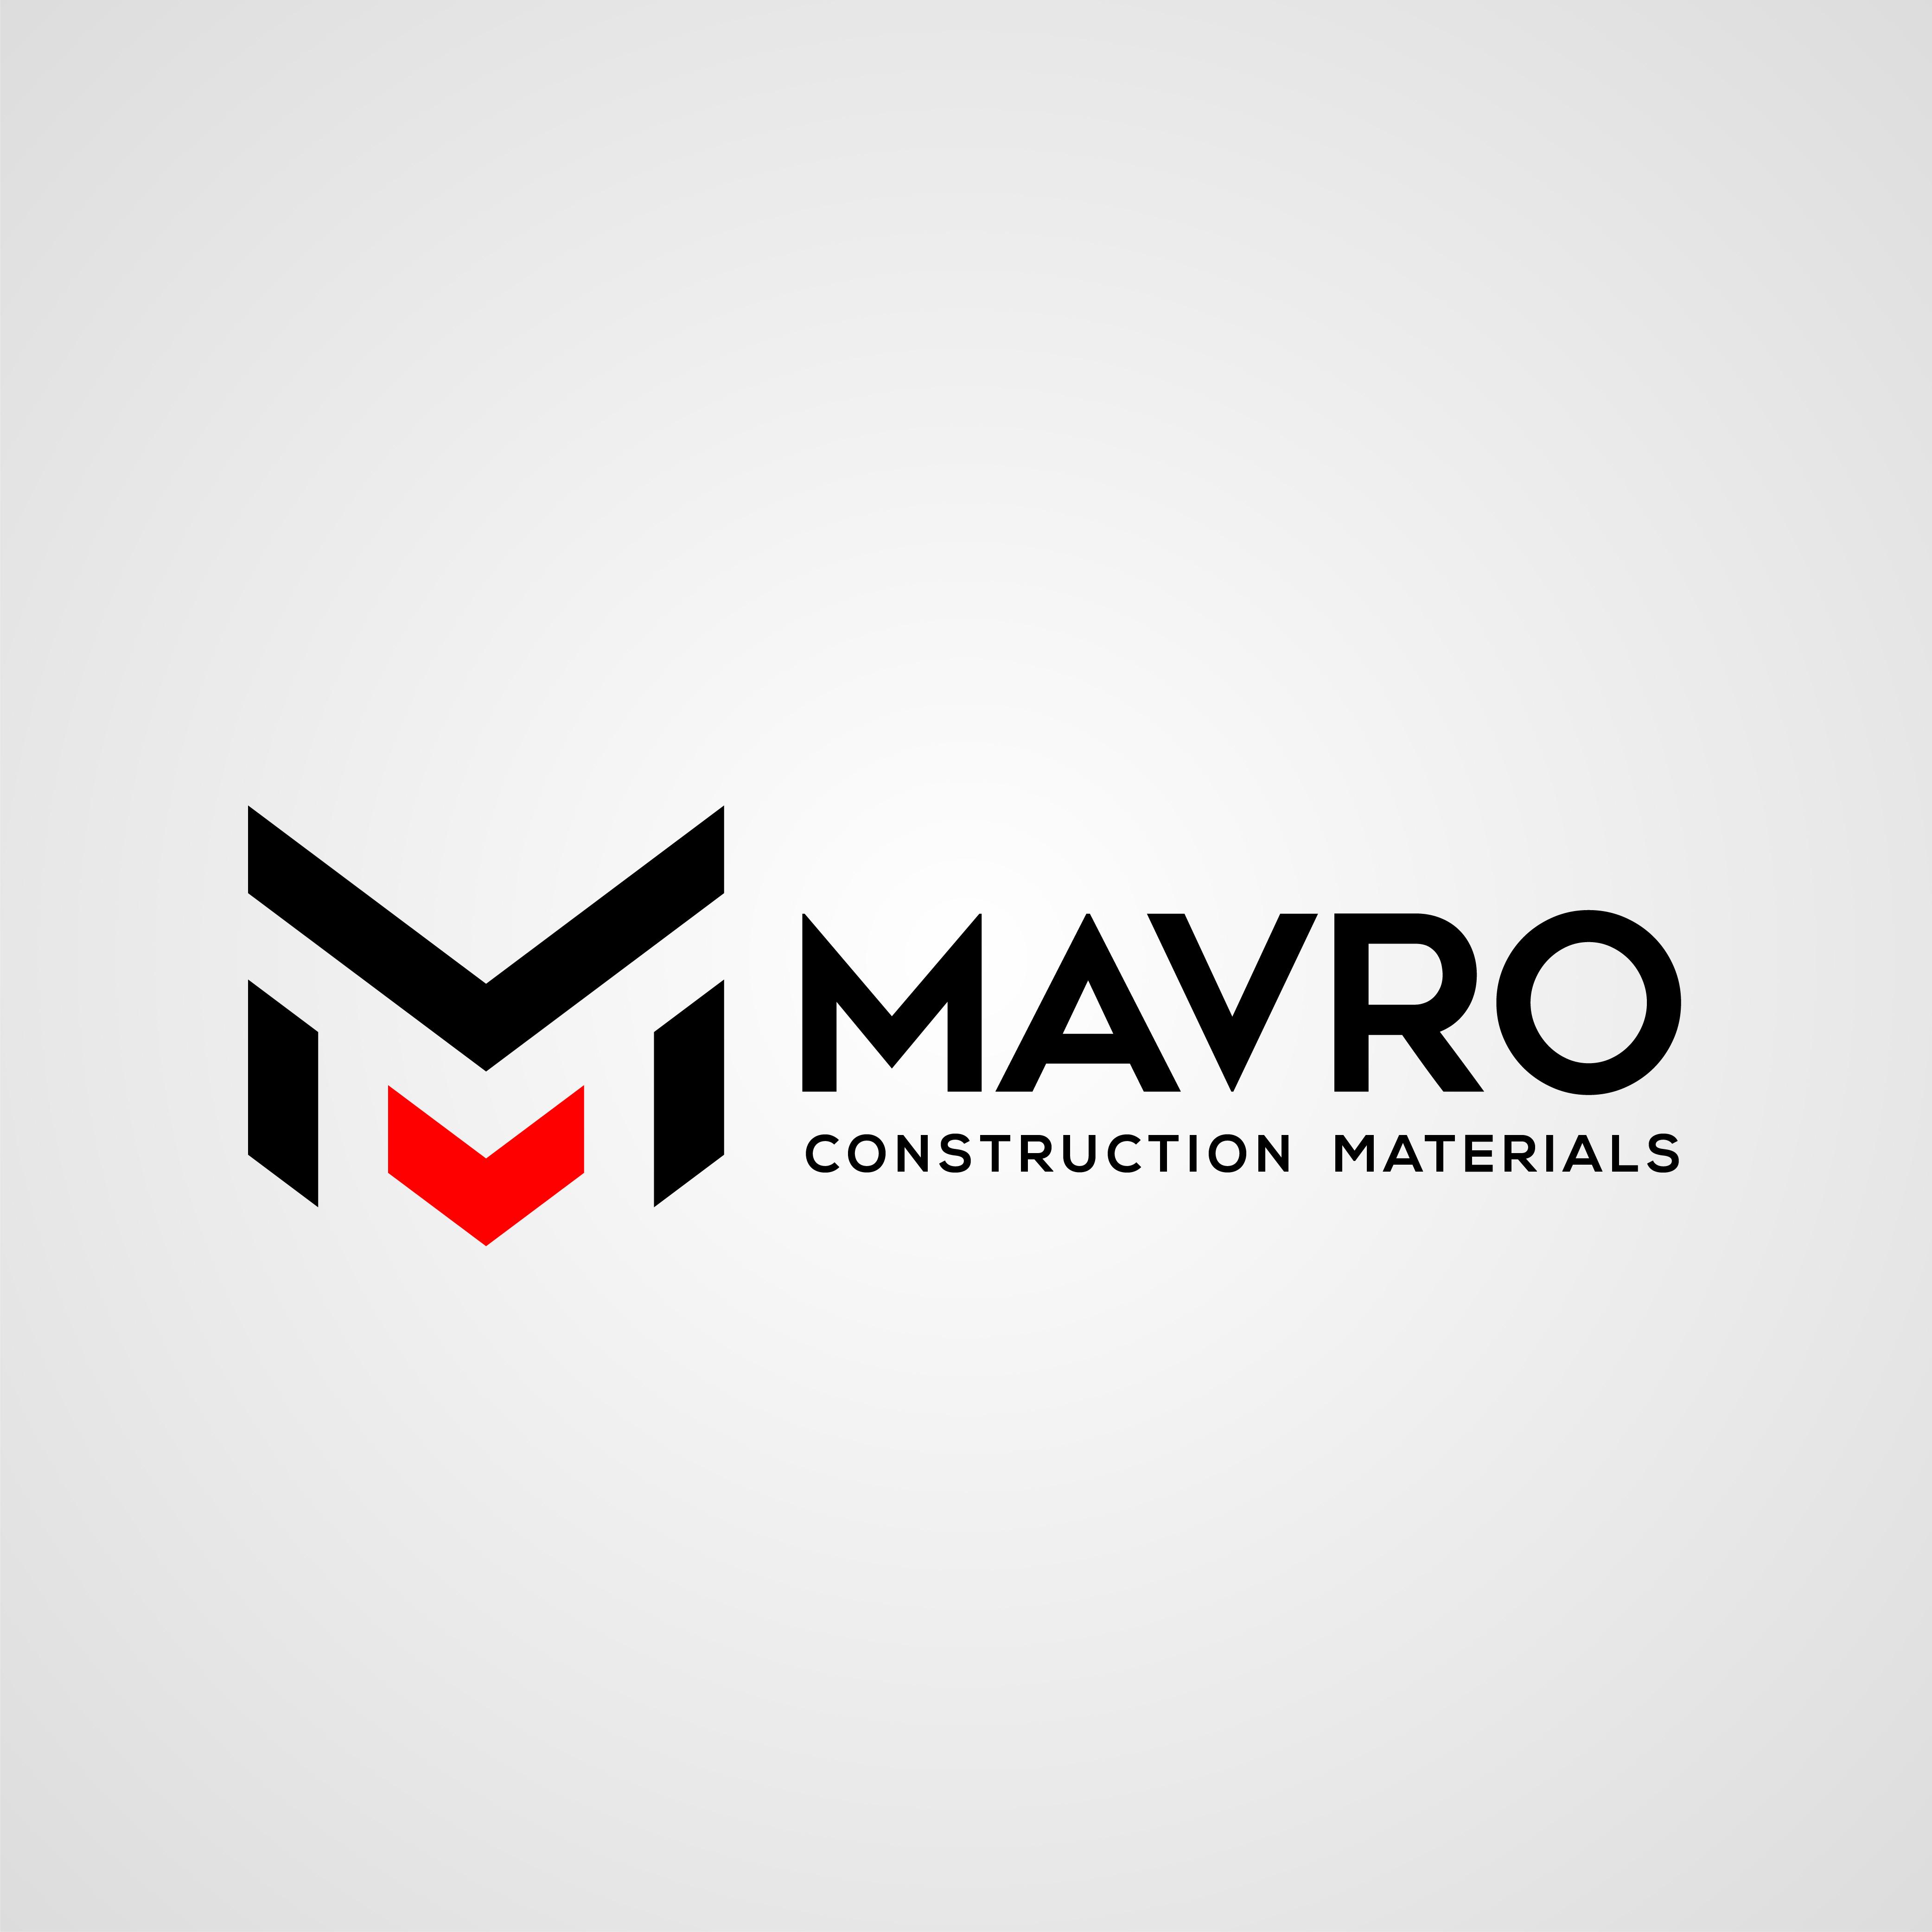 MAVRO CONSTRUCTION MATERIALS